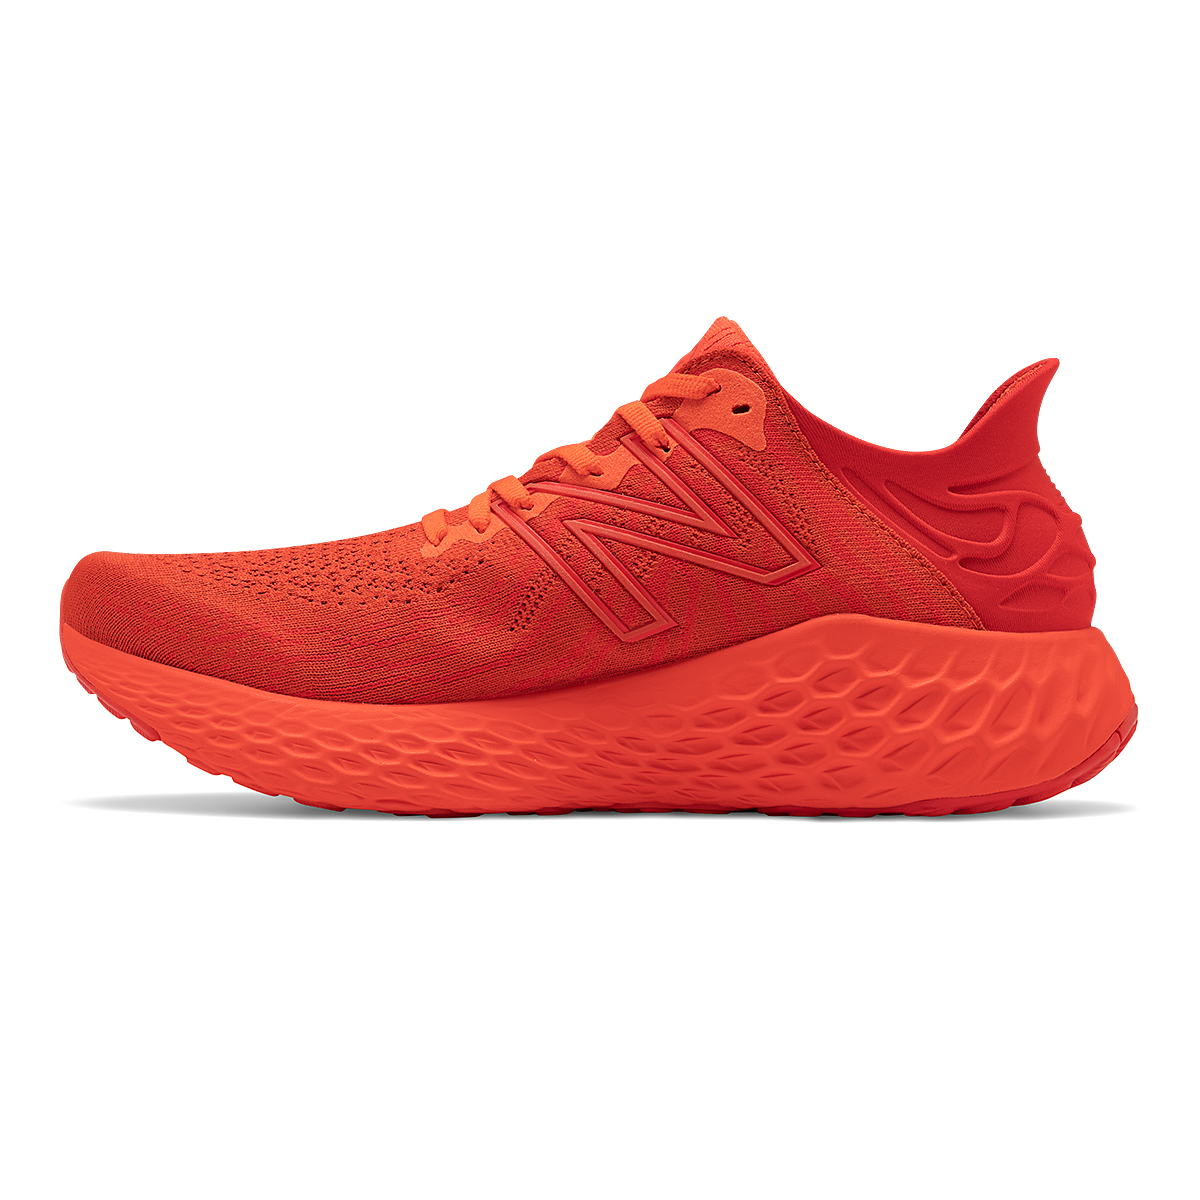 Men's New Balance Fresh Foam 1080V11 Running Shoe - Color: Ghost Pepper/Velocity Red - Size: 6 - Width: Wide, Ghost Pepper/Velocity Red, large, image 2